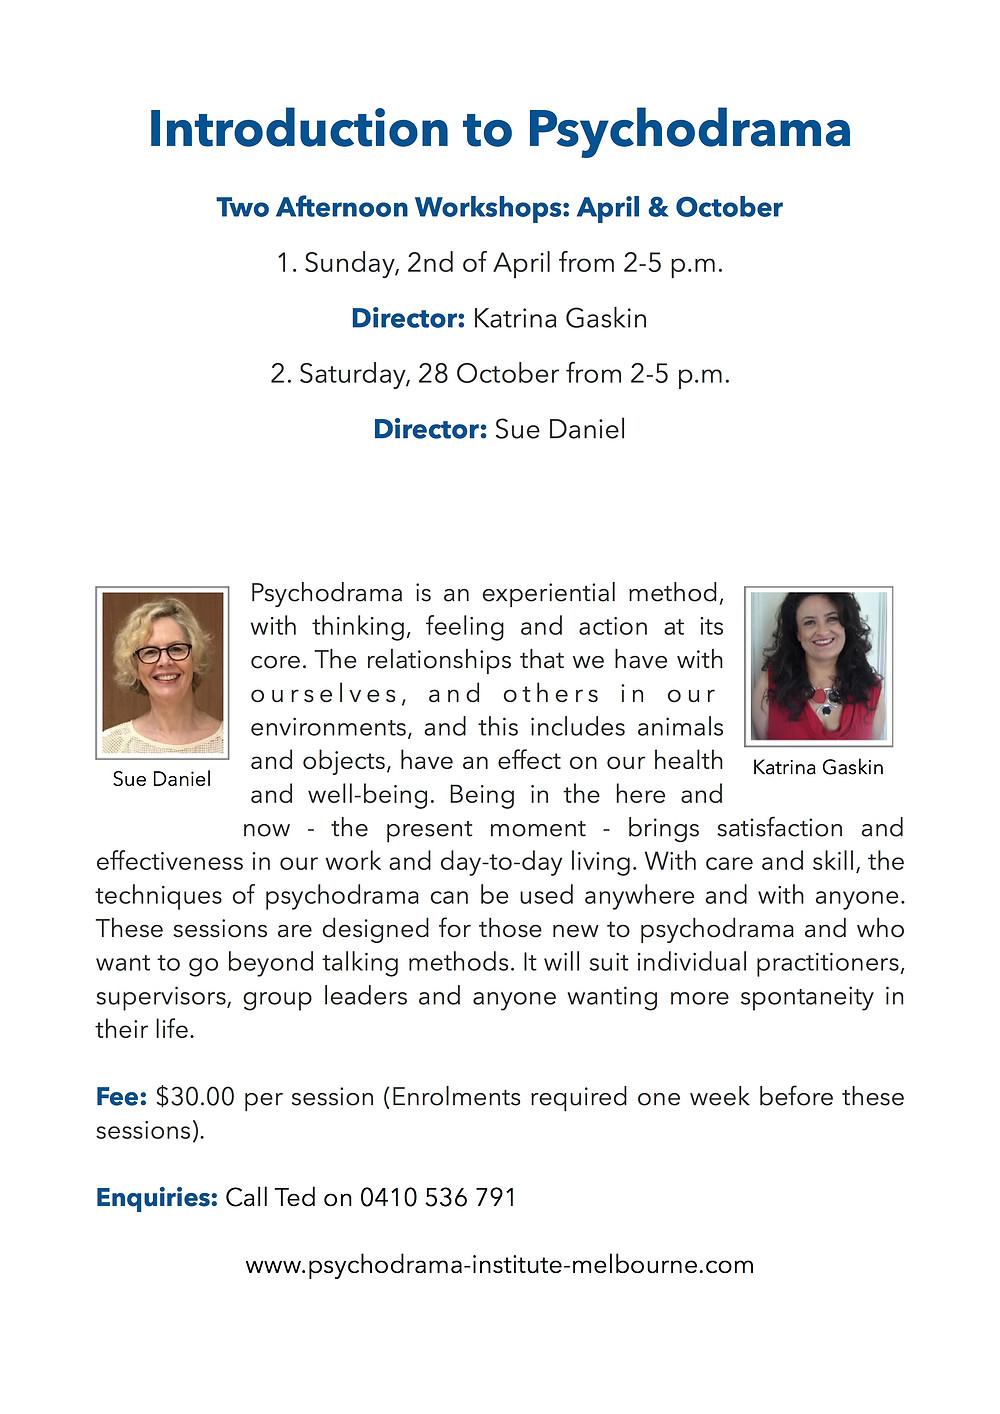 An Introduction to Psychodrama with Katrina Gaskin